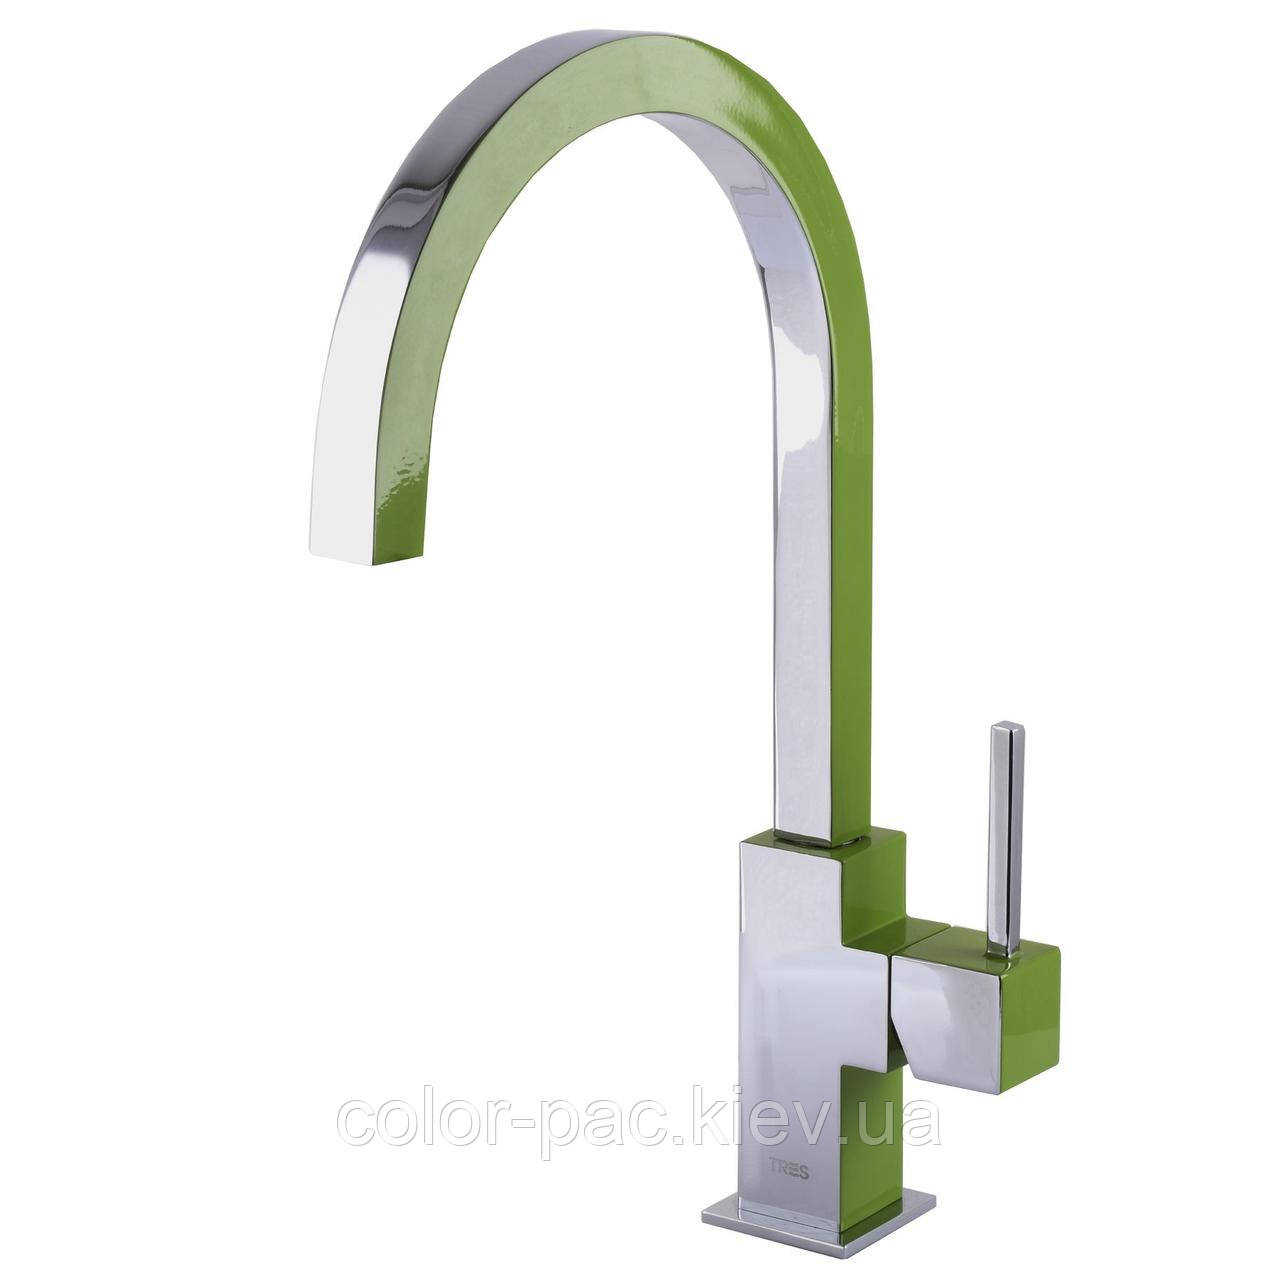 Змішувач для кухні TRES CUADRO VE-TOP 130497